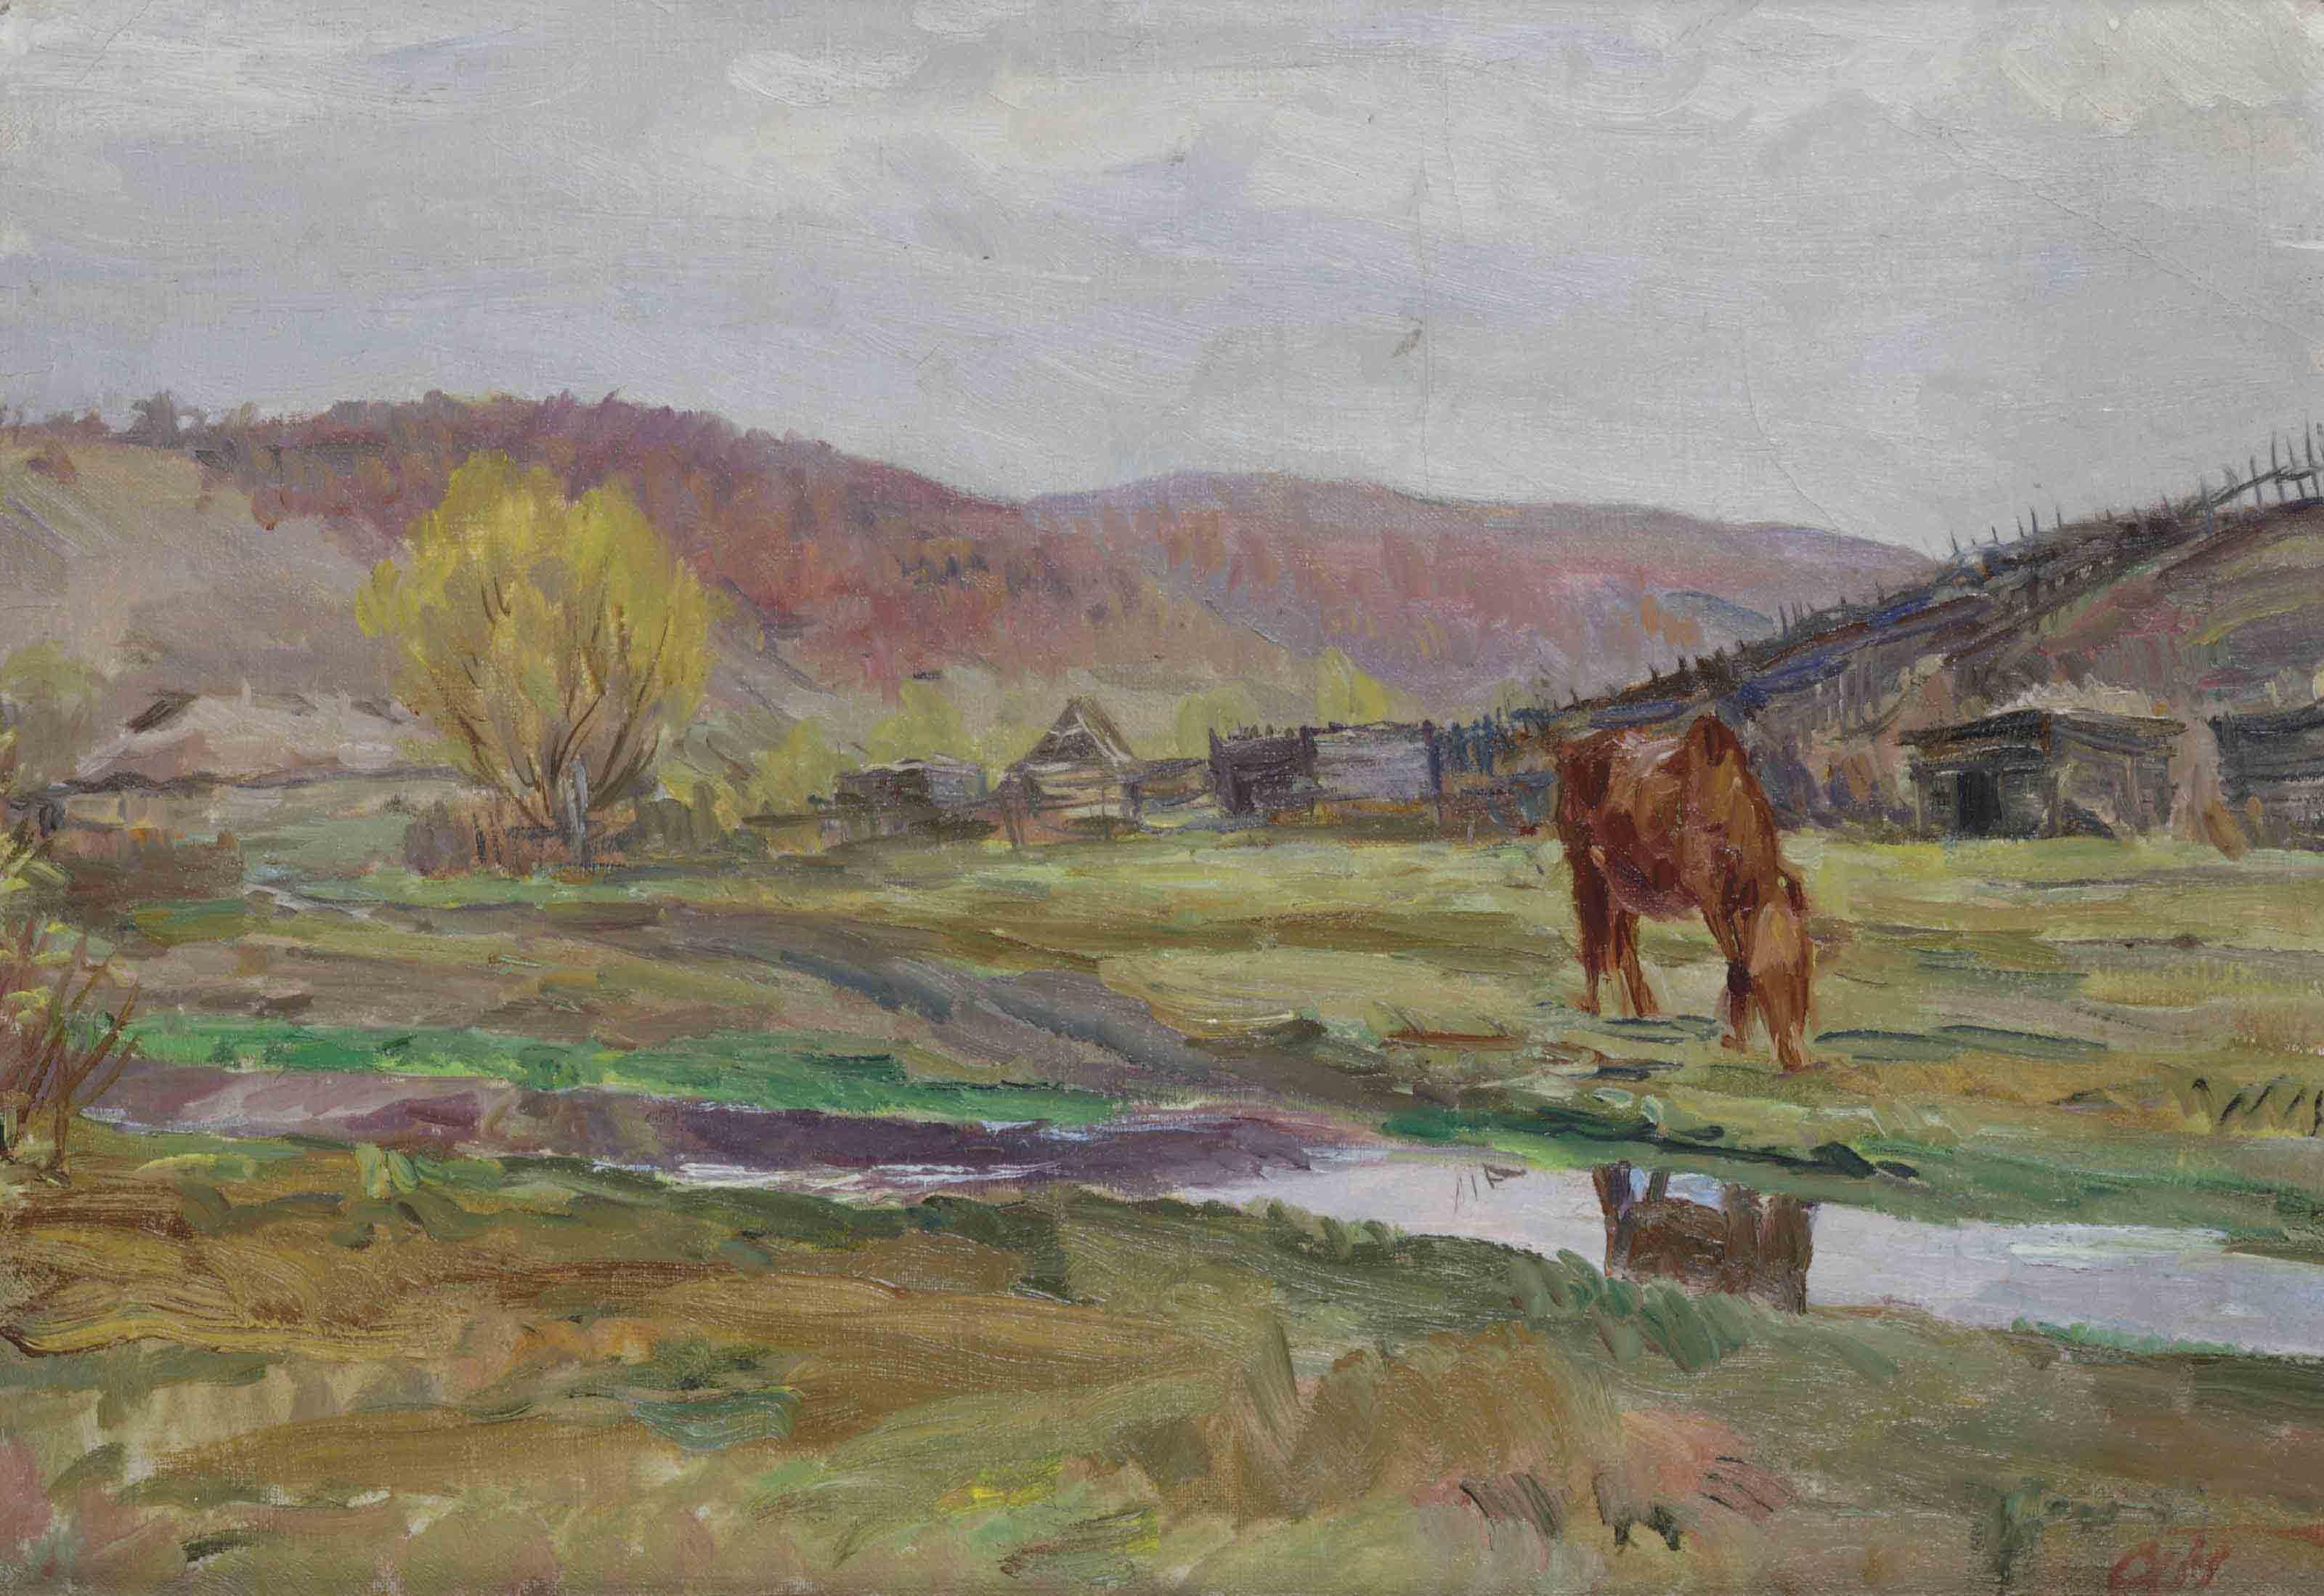 A horse grazing in a field along a river